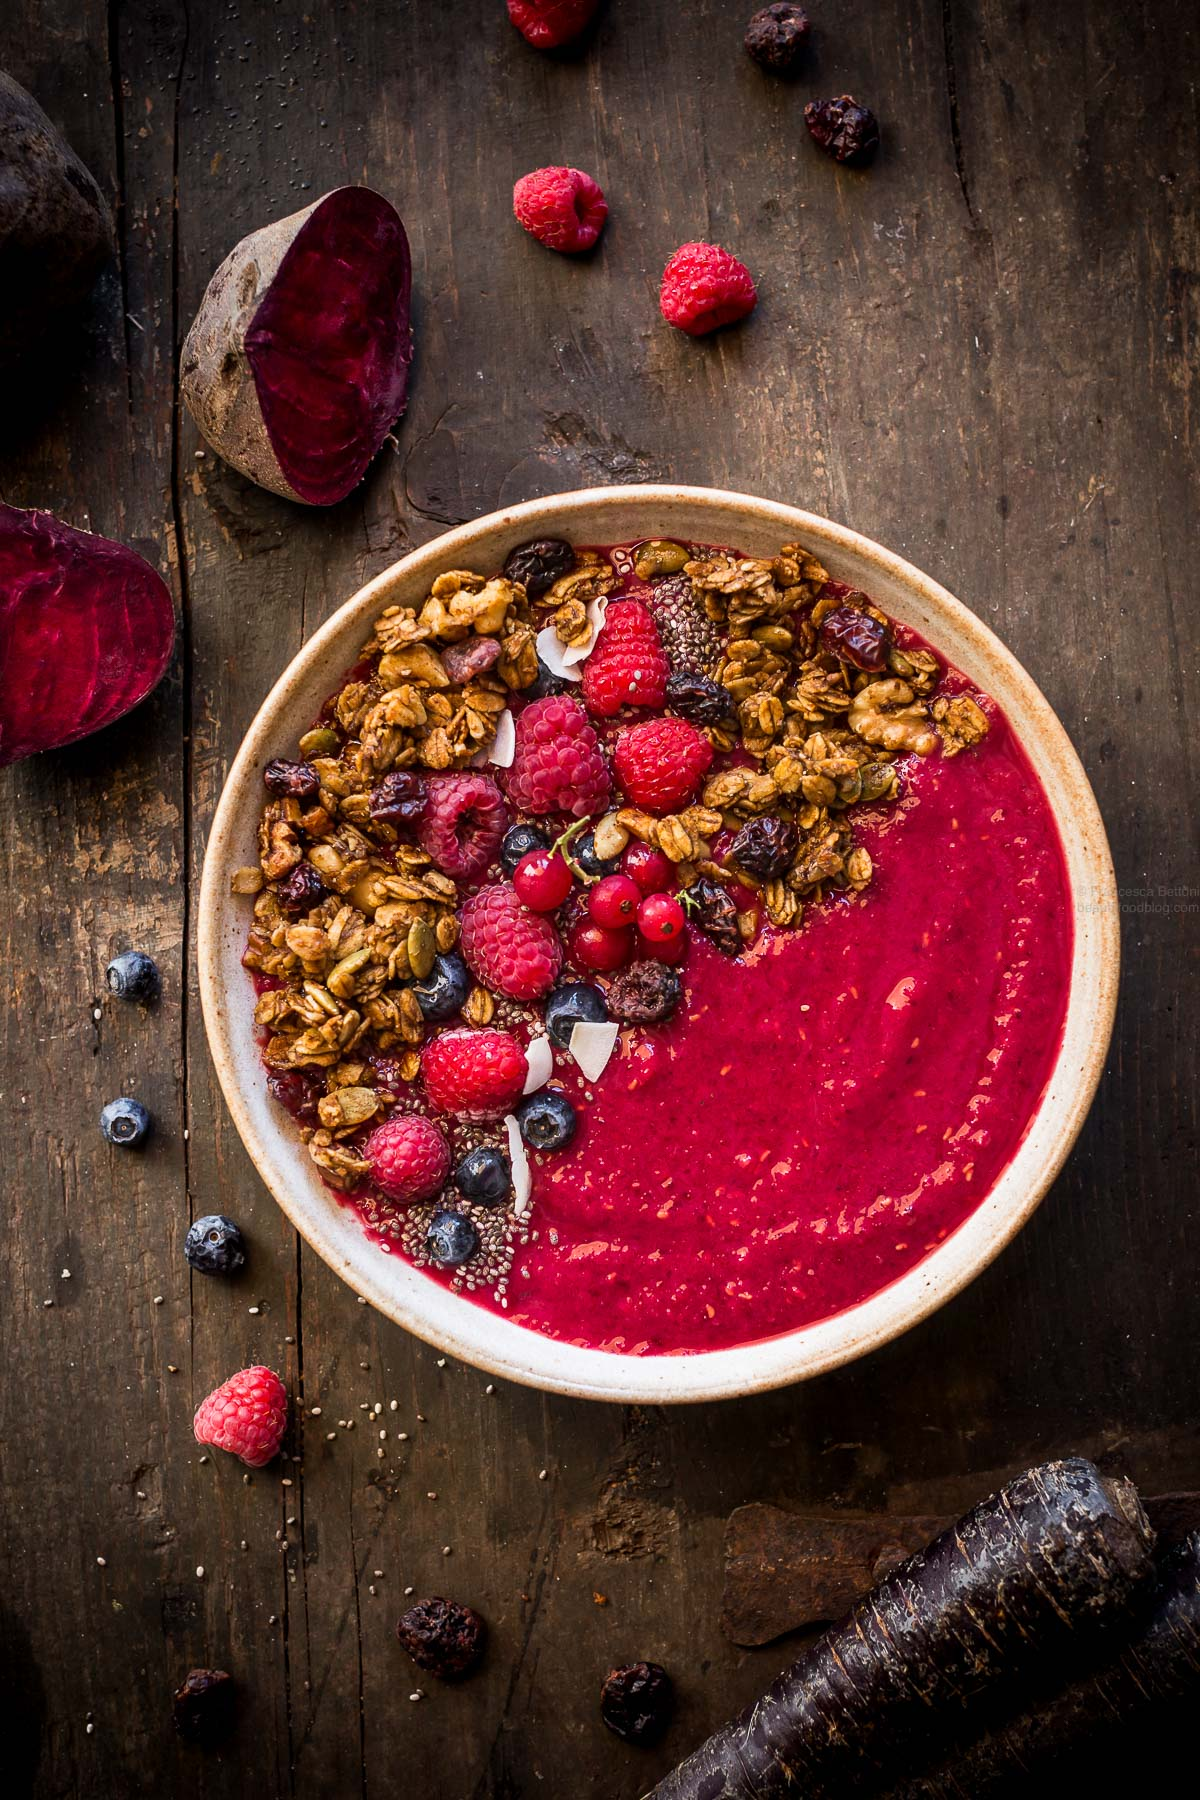 vegan beet smoothie bowl with pumpkin granola - detox smoothie bowl alla barbabietola #beet #smoothiebowl #glutenfree #vegan #granola